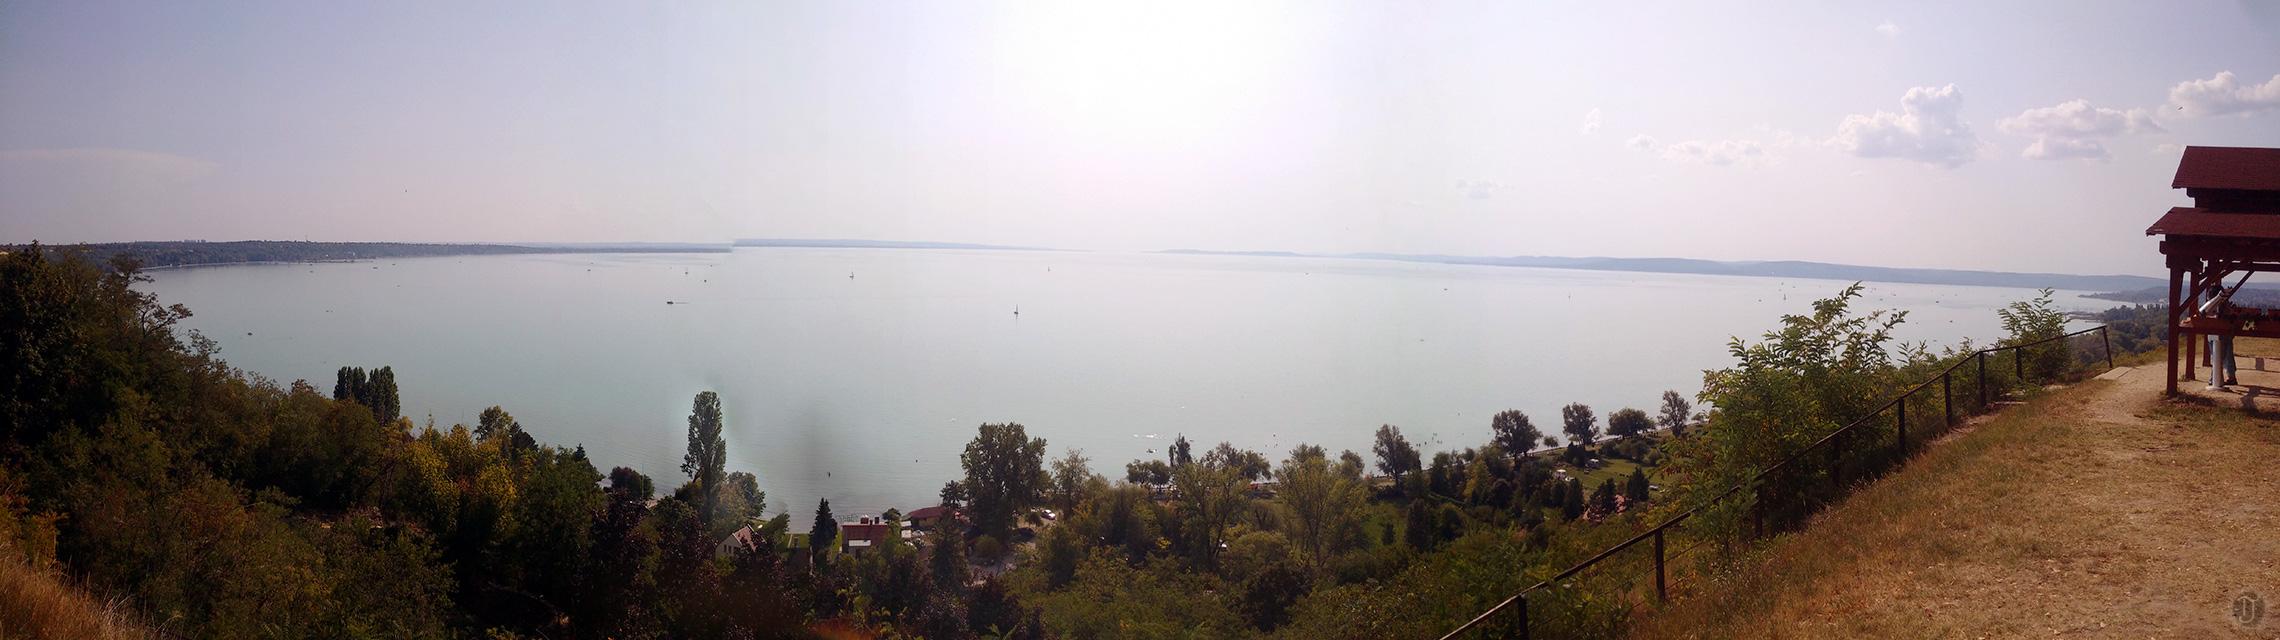 Lake Balaton Shoreline - Panorama